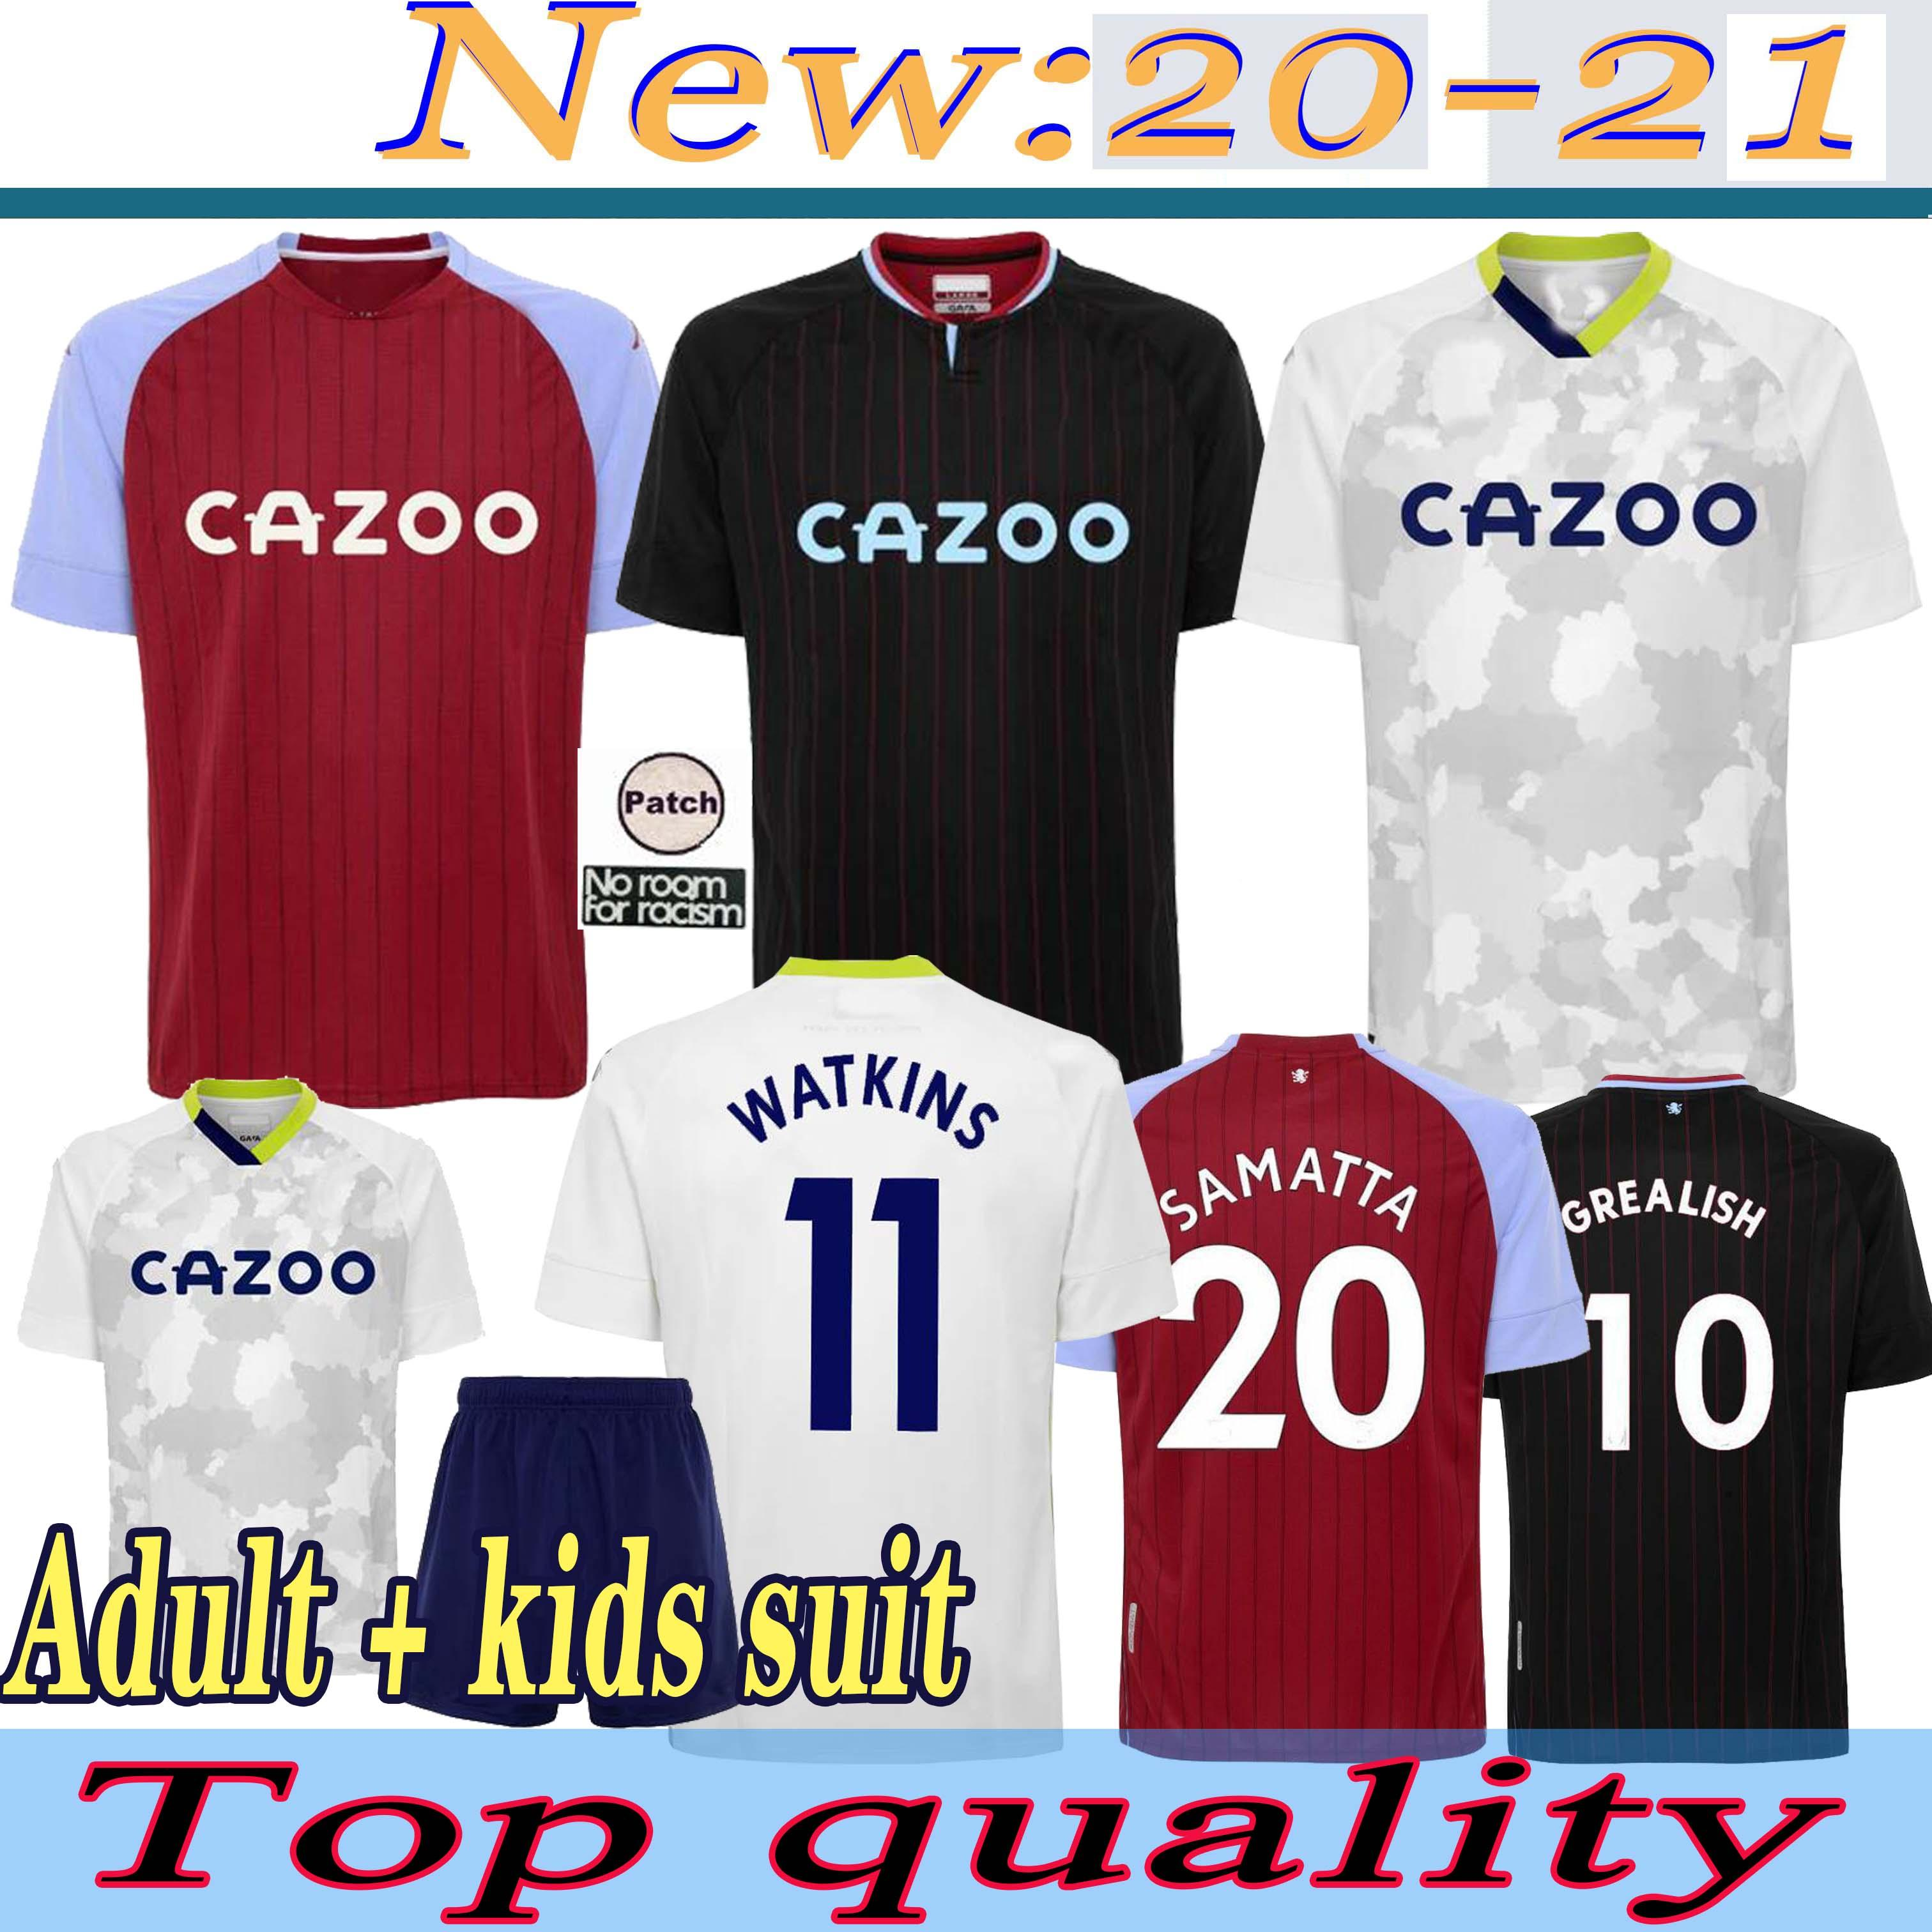 Jerseys de futebol grealish 20 21 Home Grealish M. Trezeguet Wesley El Ghazi Hourihane Douglas McGinn Barkley Watkins 2020 2021 Homem + Crianças